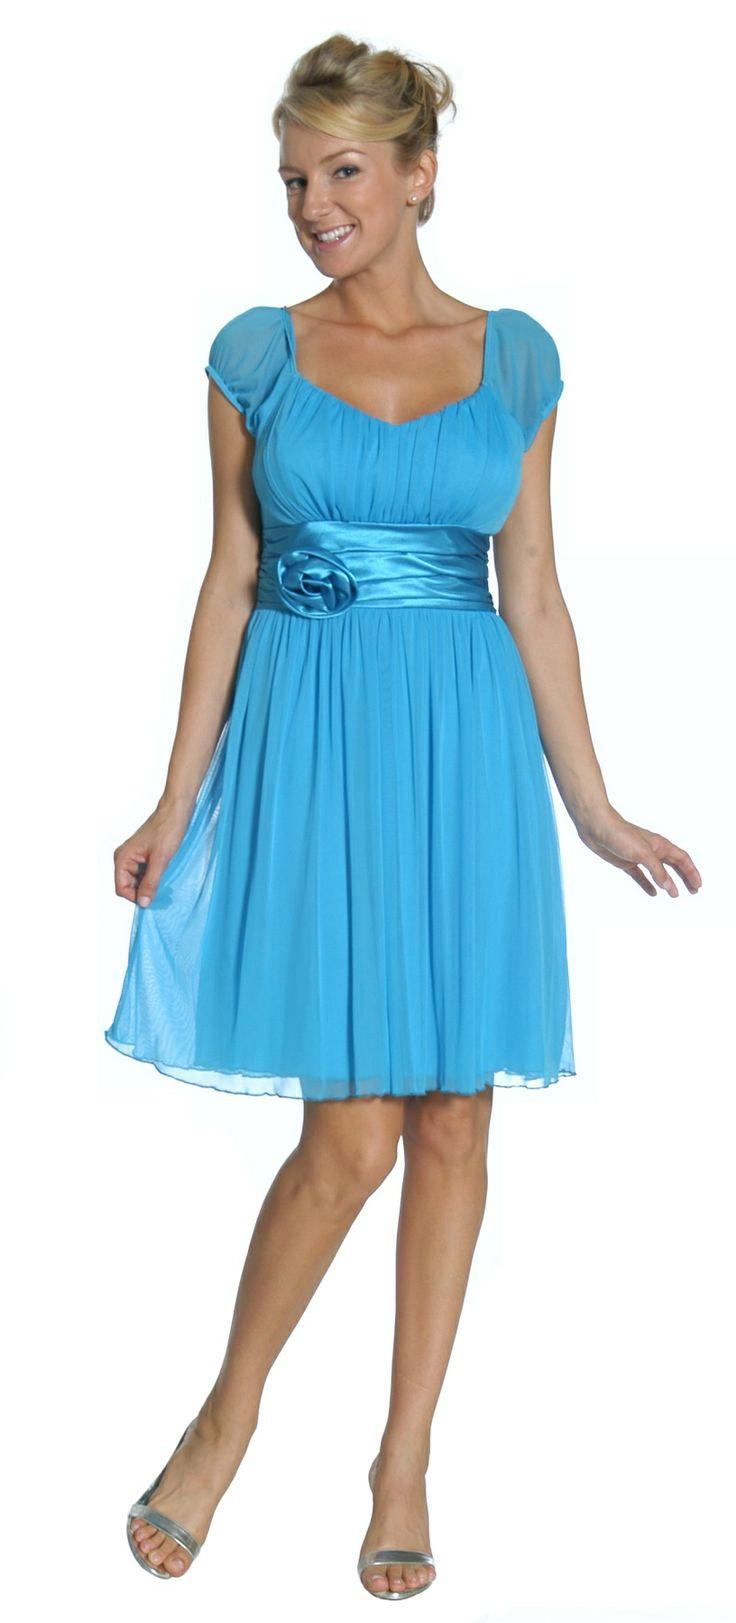 Short Turquoise Show Choir Dress Cap Sleeves Chiffon Knee Length